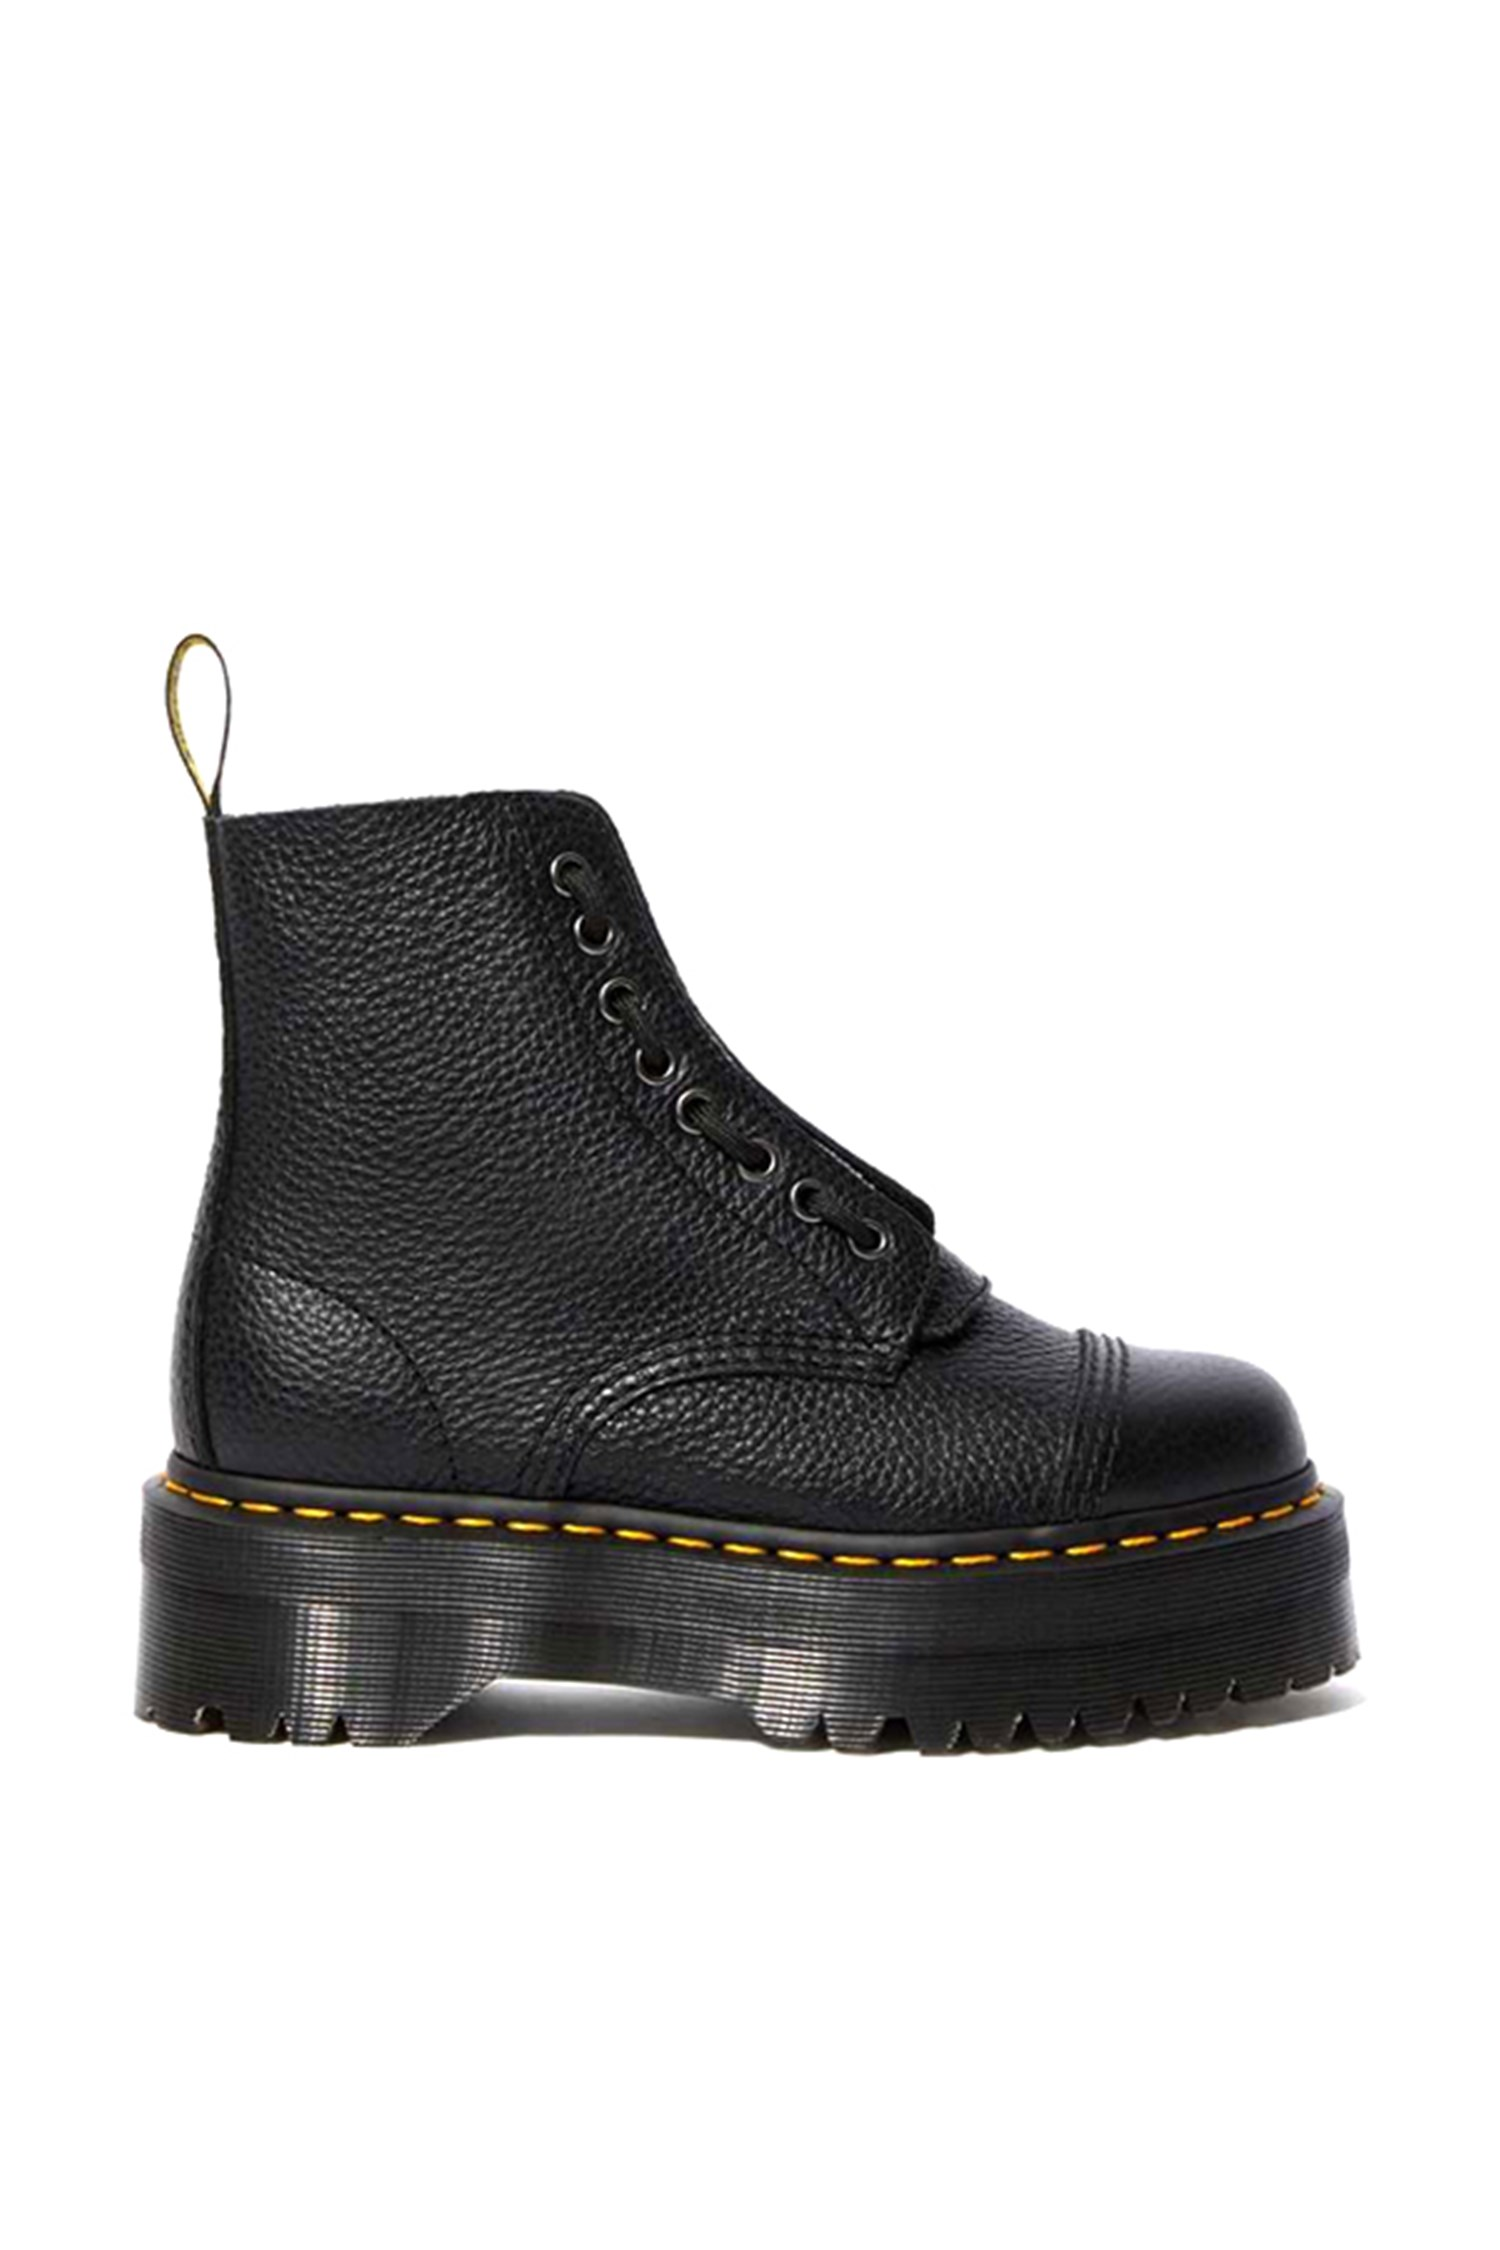 Dr. Martens Boots boots Women Black